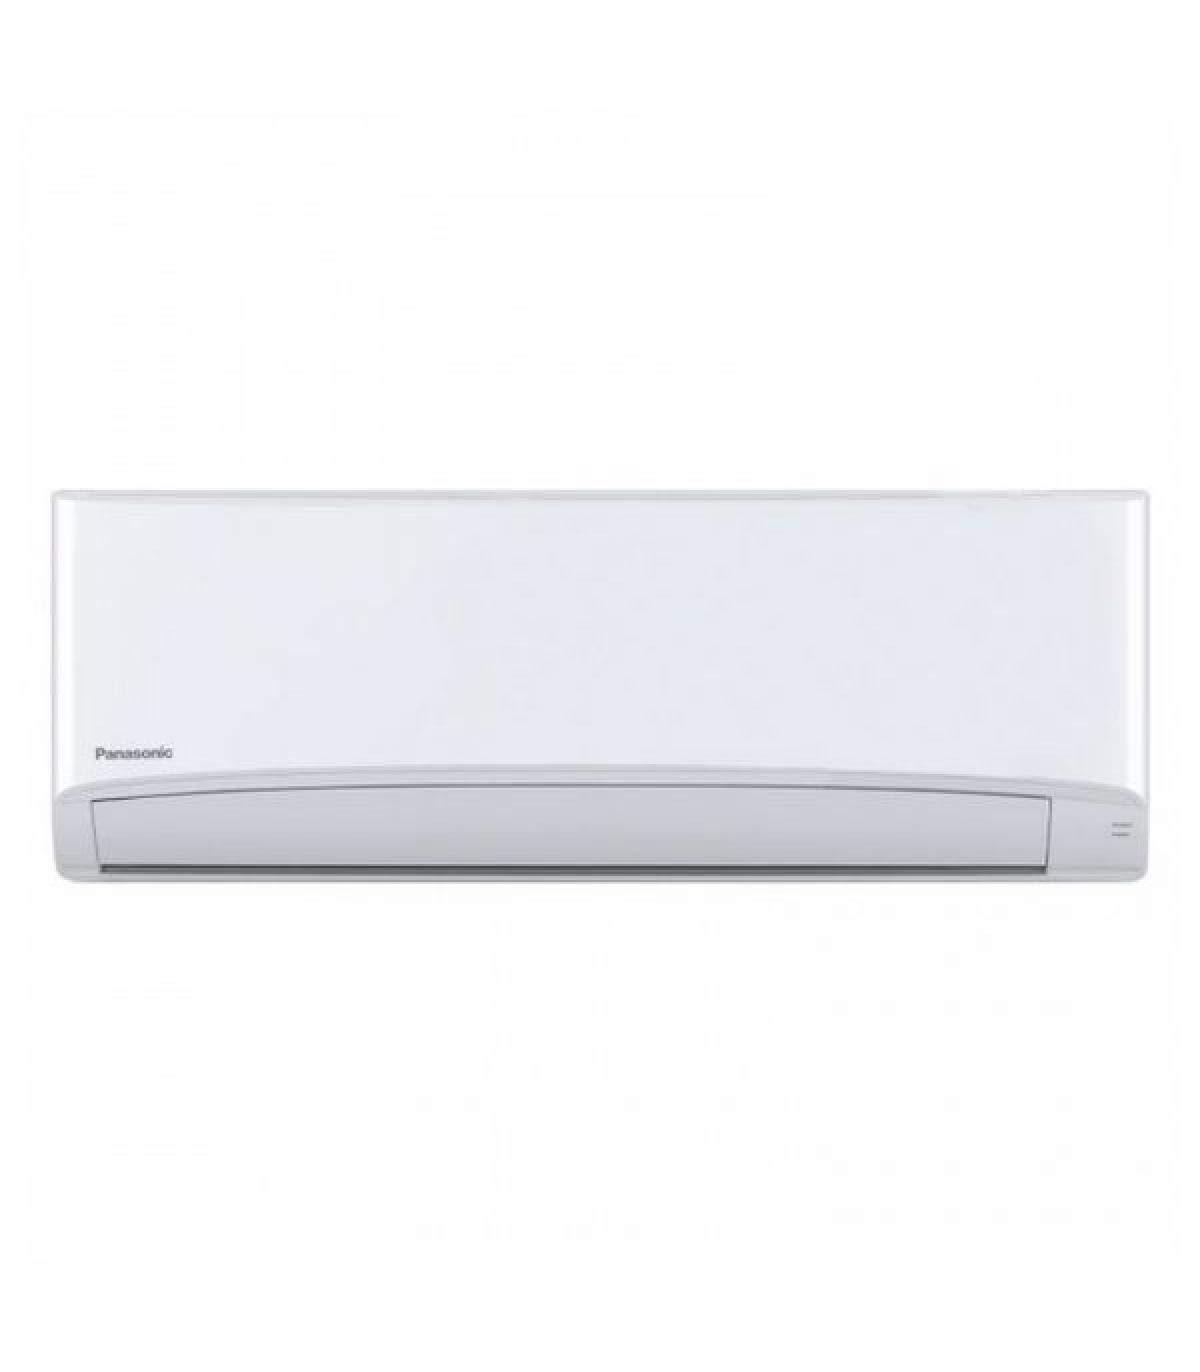 Aire Acondicionado Panasonic TZ35TKE 3000 Fr R32: 533.48: Amazon ...